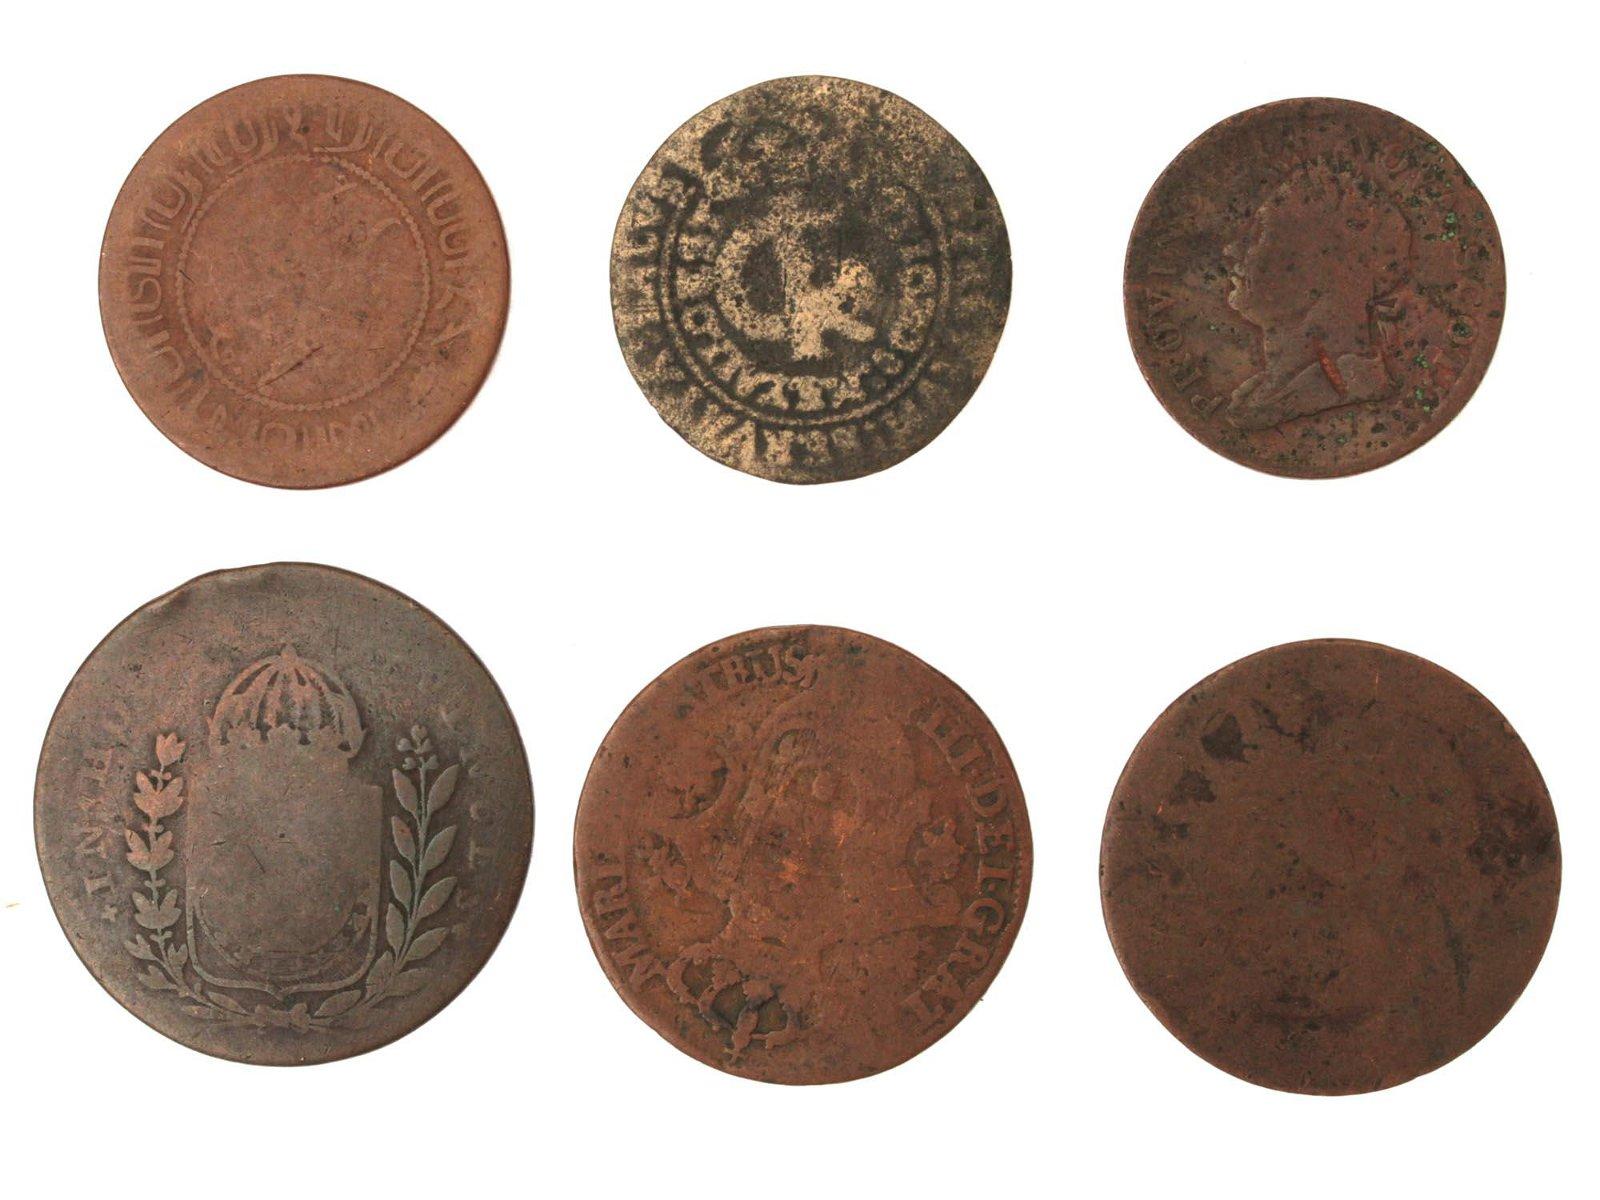 A SET OF ANTIQUE EUROPEAN 17-19TH CENTURY COINS